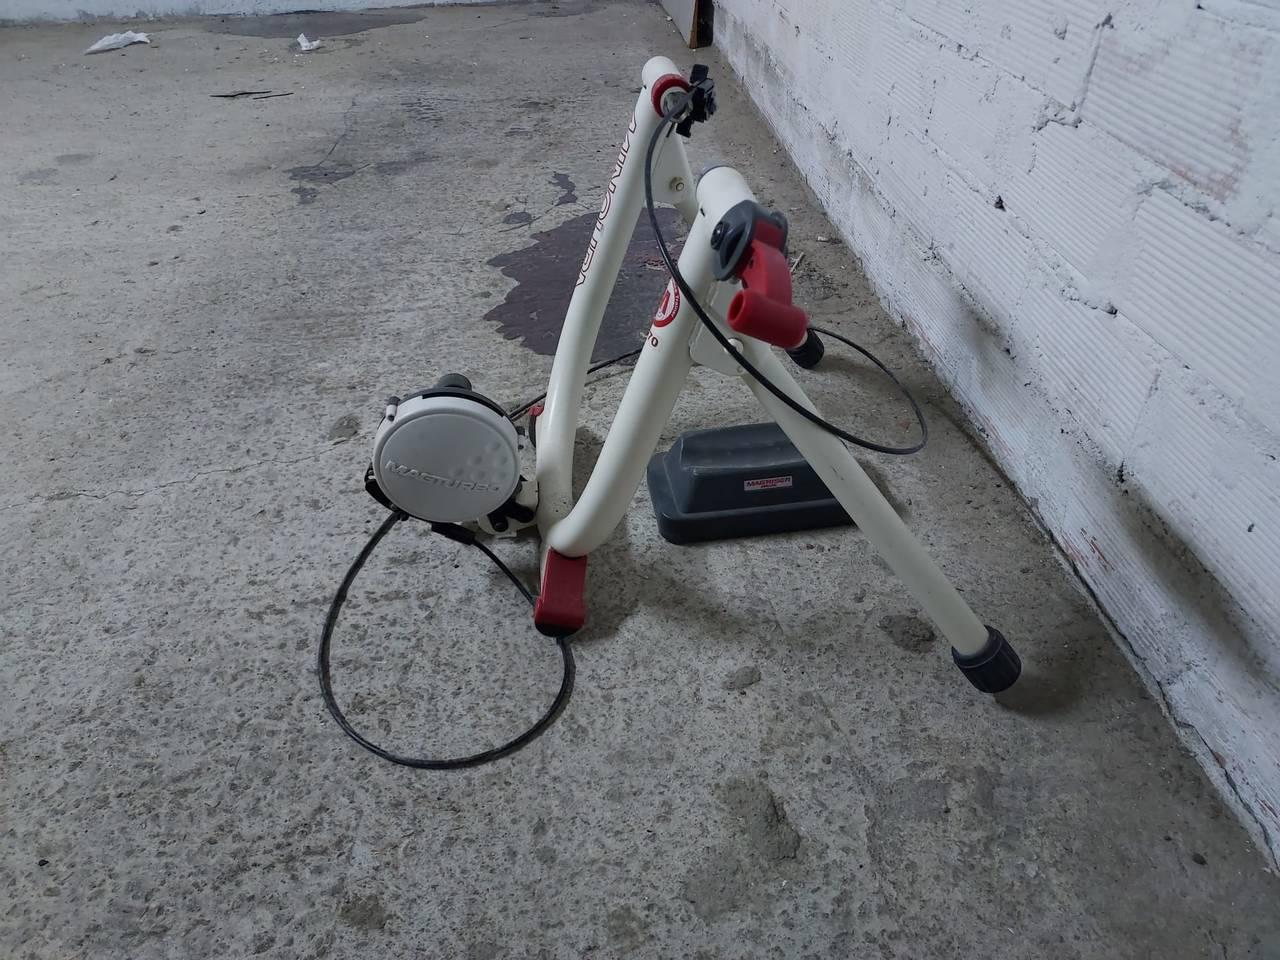 Rodillo de entrenamiento bicicleta.  - Foto 4